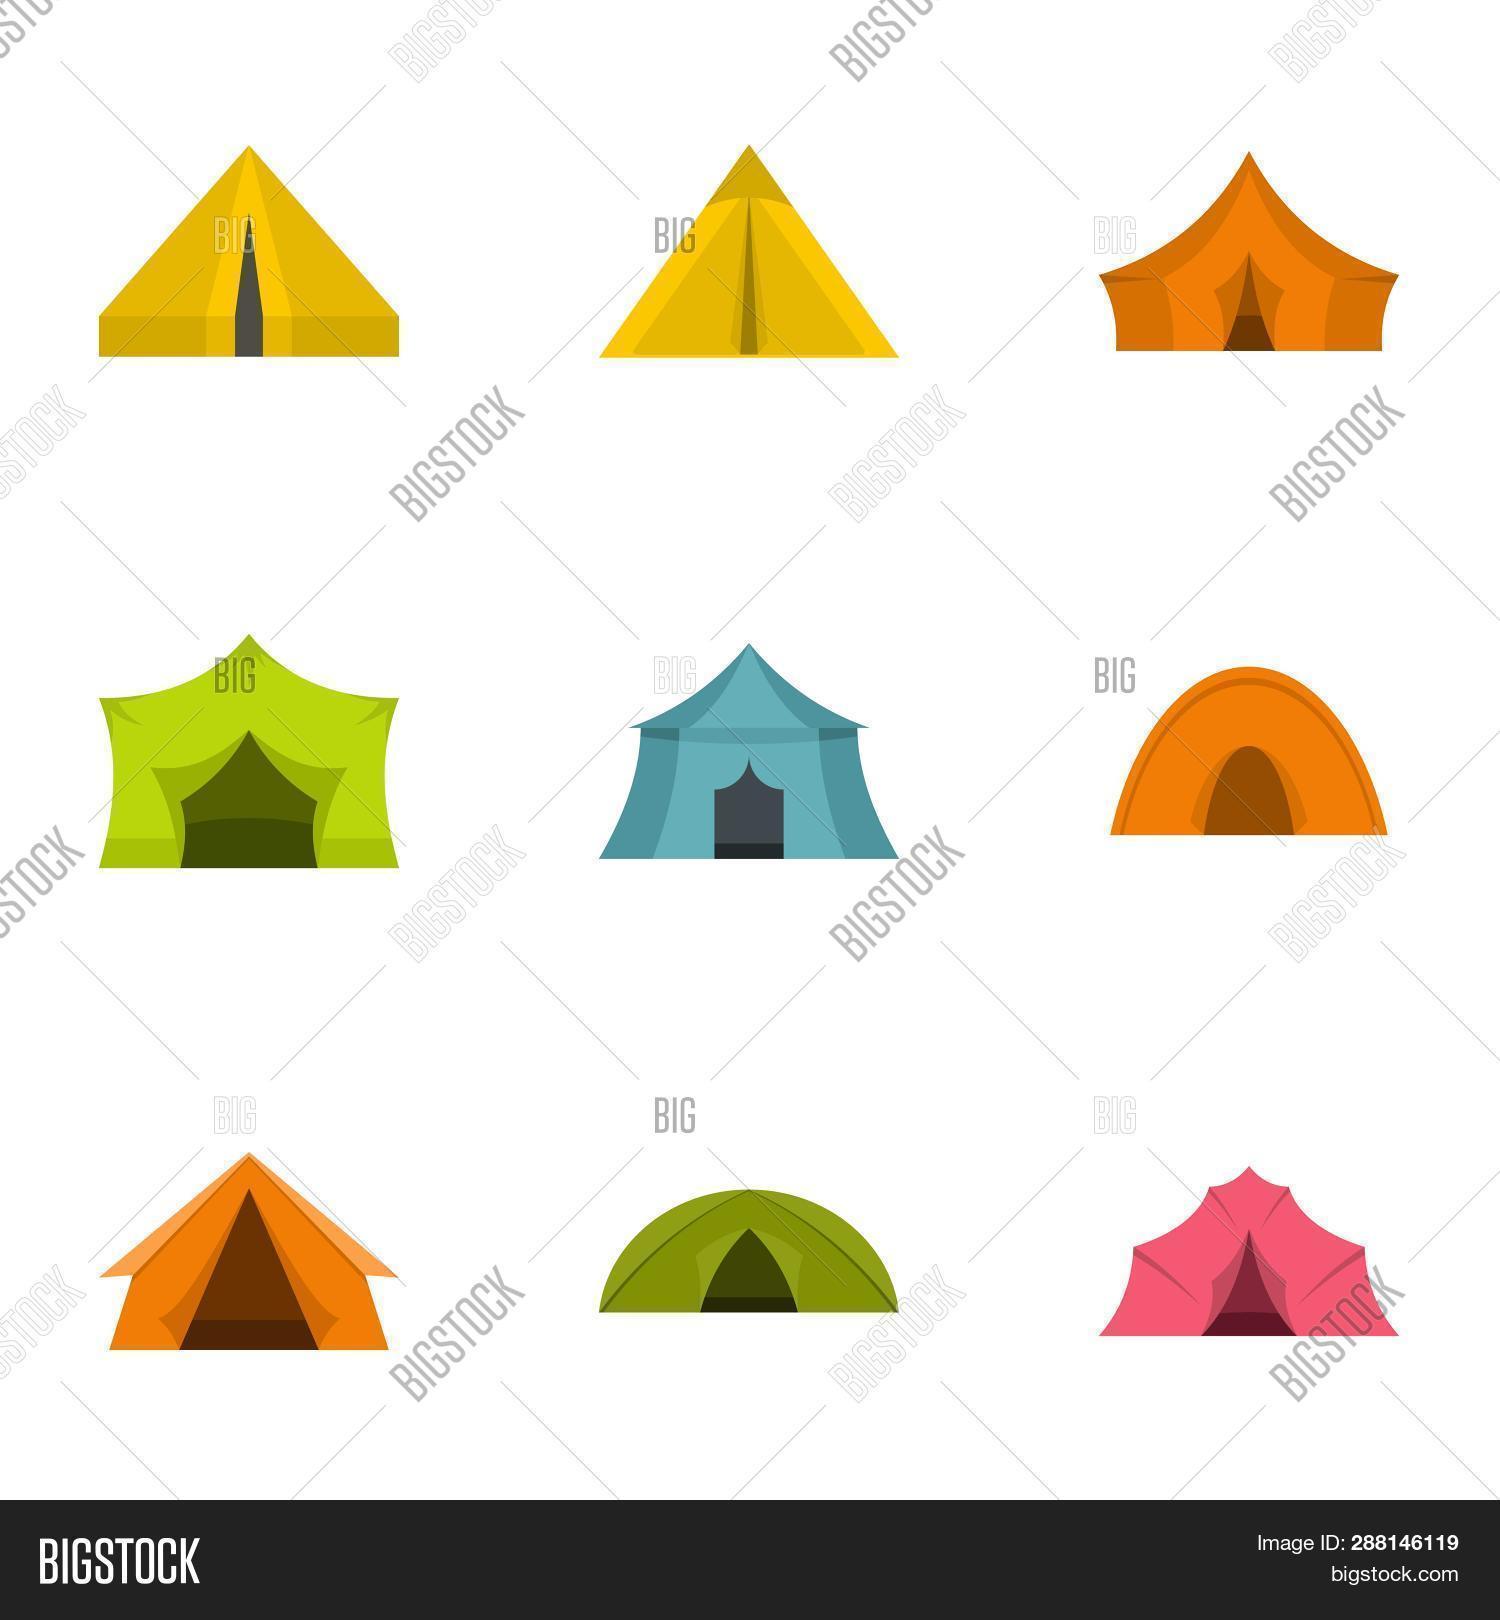 Tent Form Icon Set  Image & Photo (Free Trial) | Bigstock